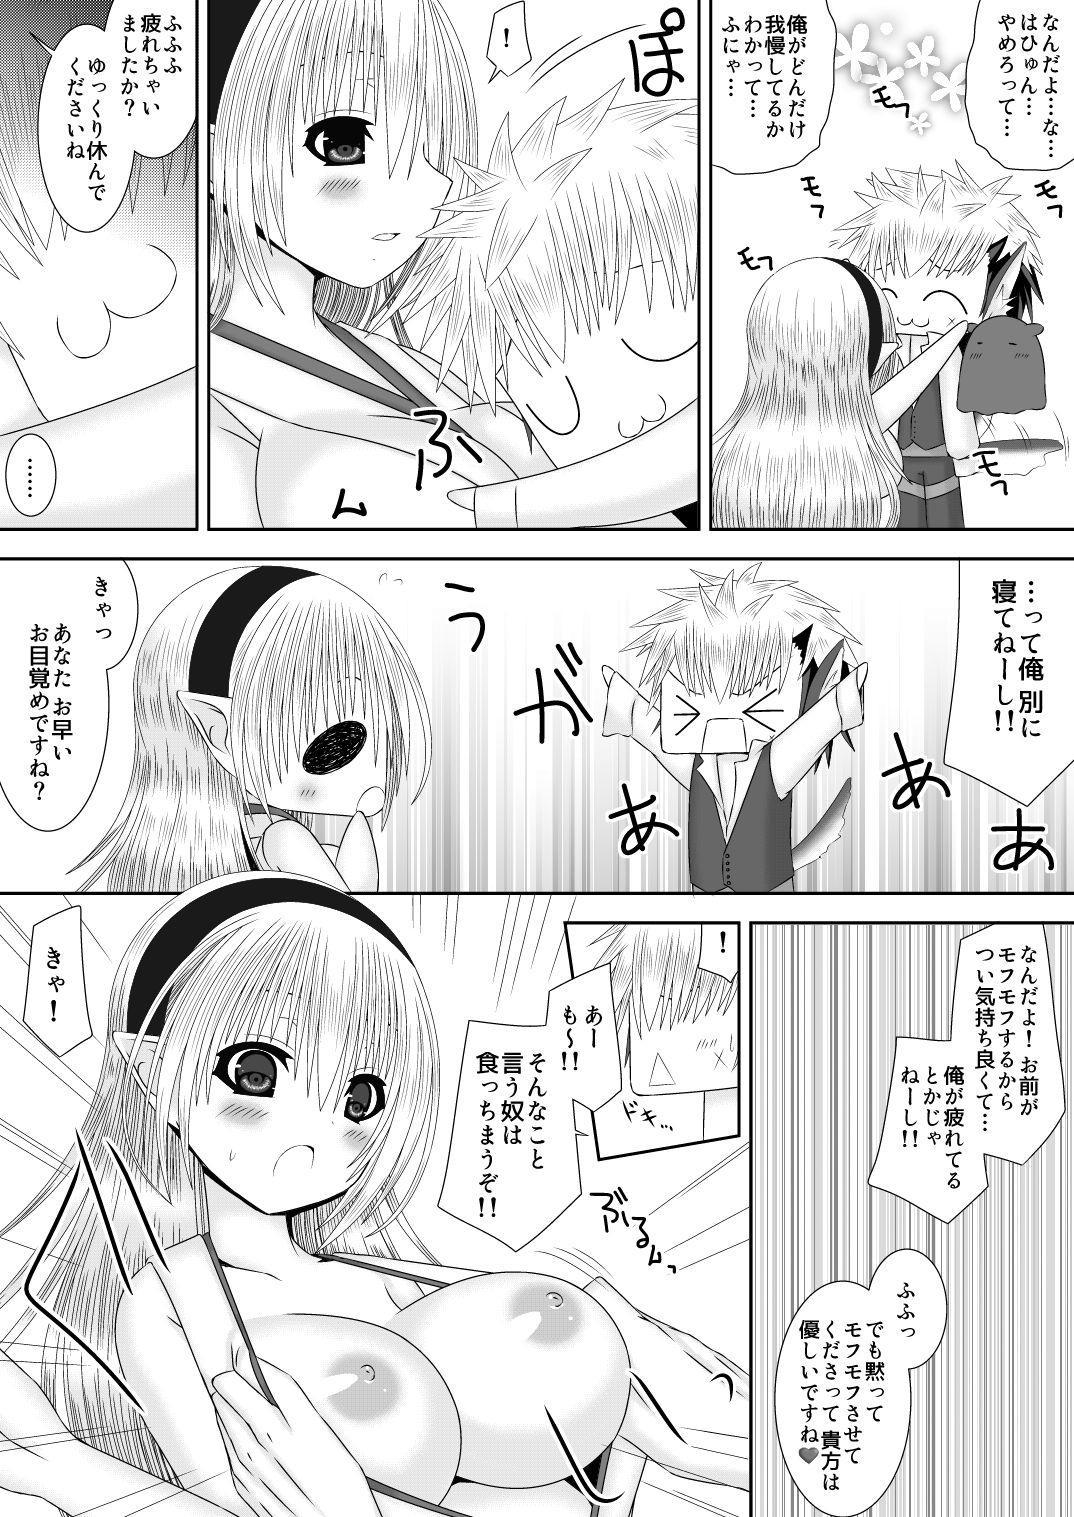 [Oda Natsuki] Ookami-san to Ohime-sama (Fire Emblem if) 3